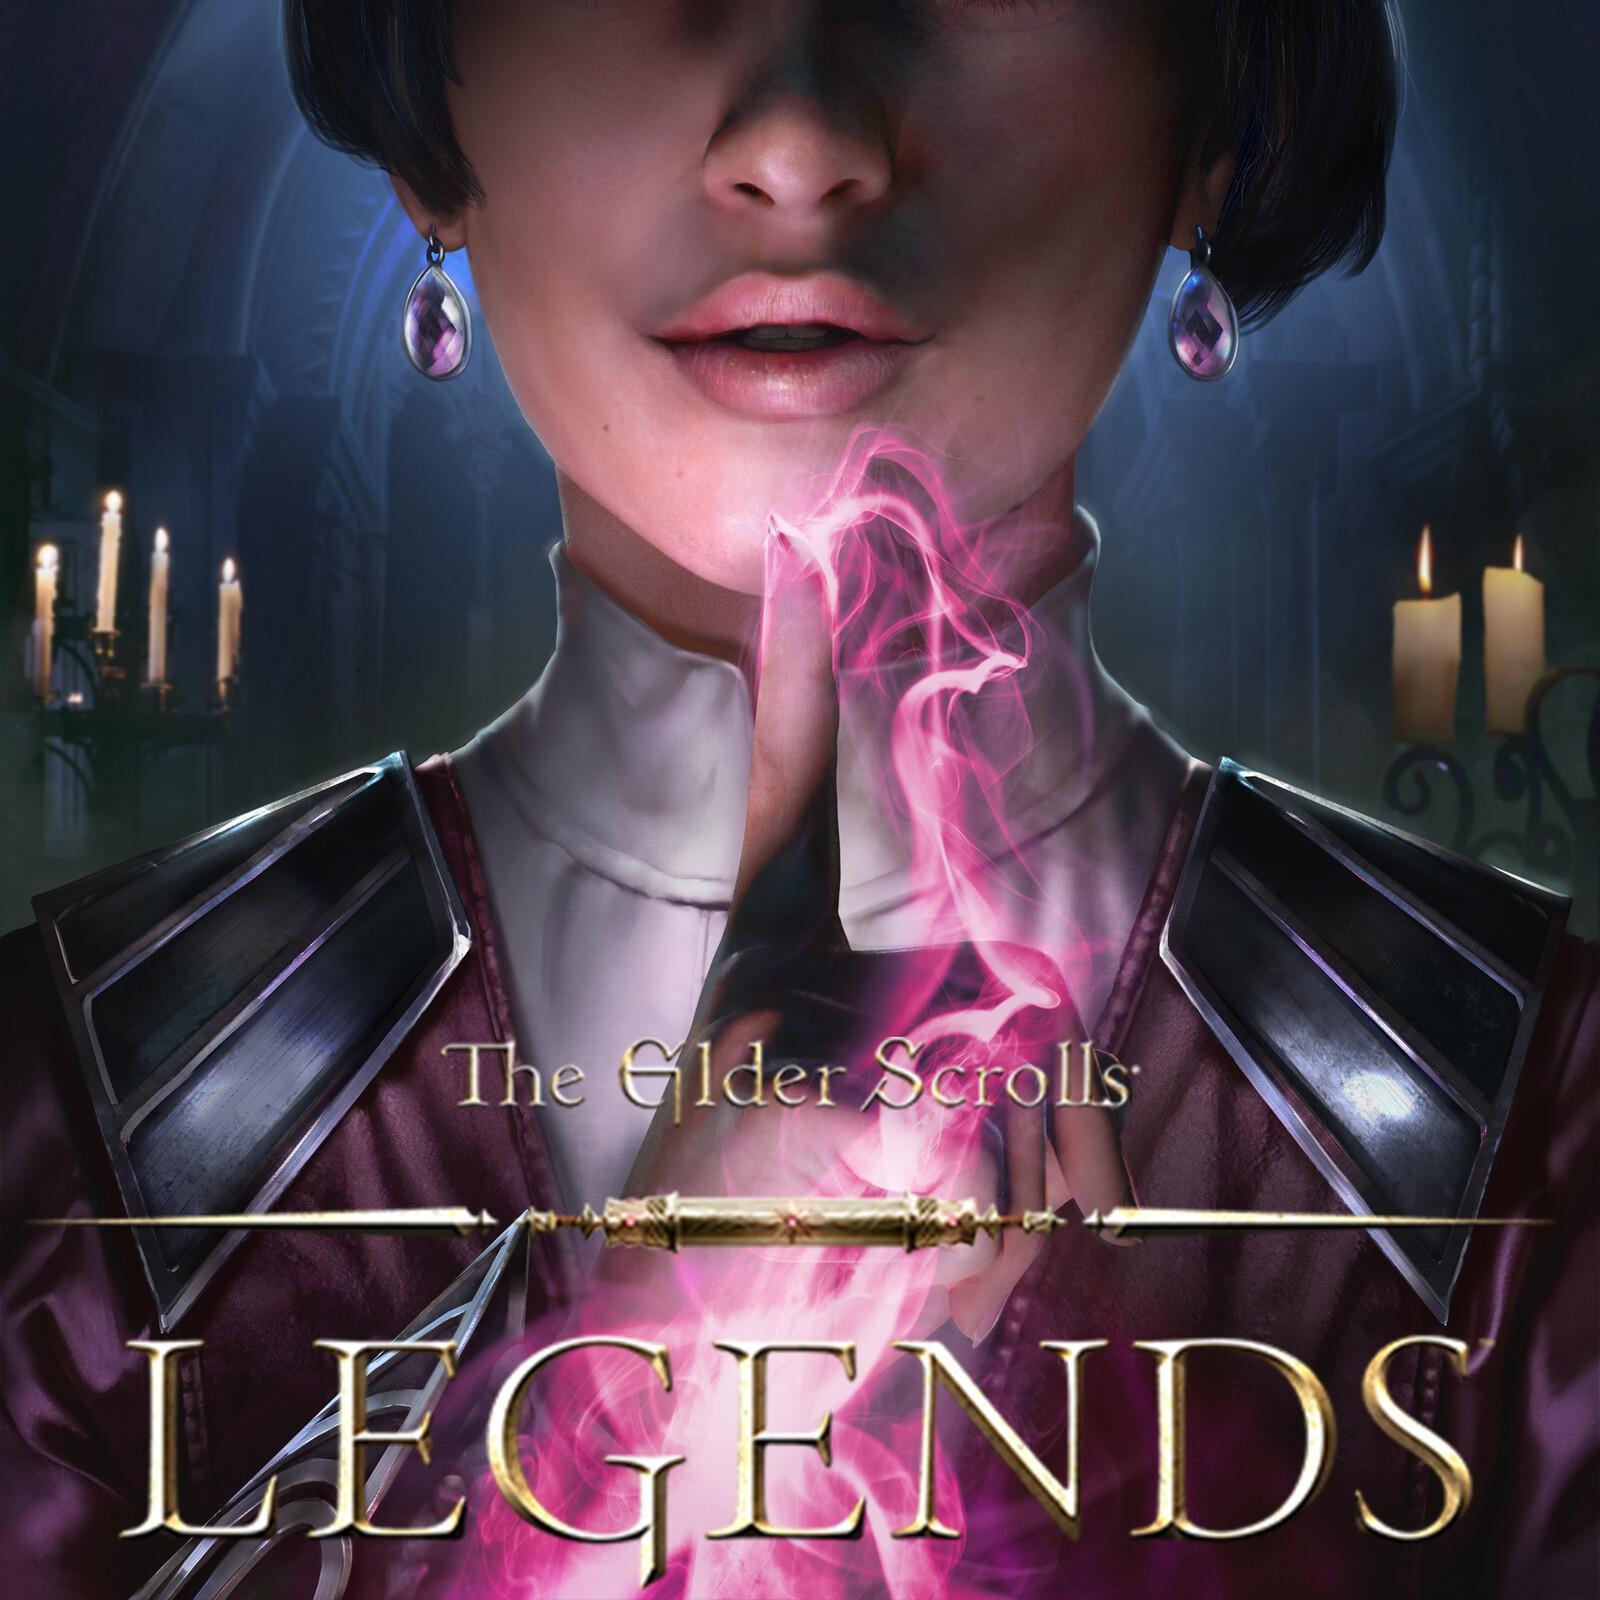 Hush - The Elder Scrolls: Legends